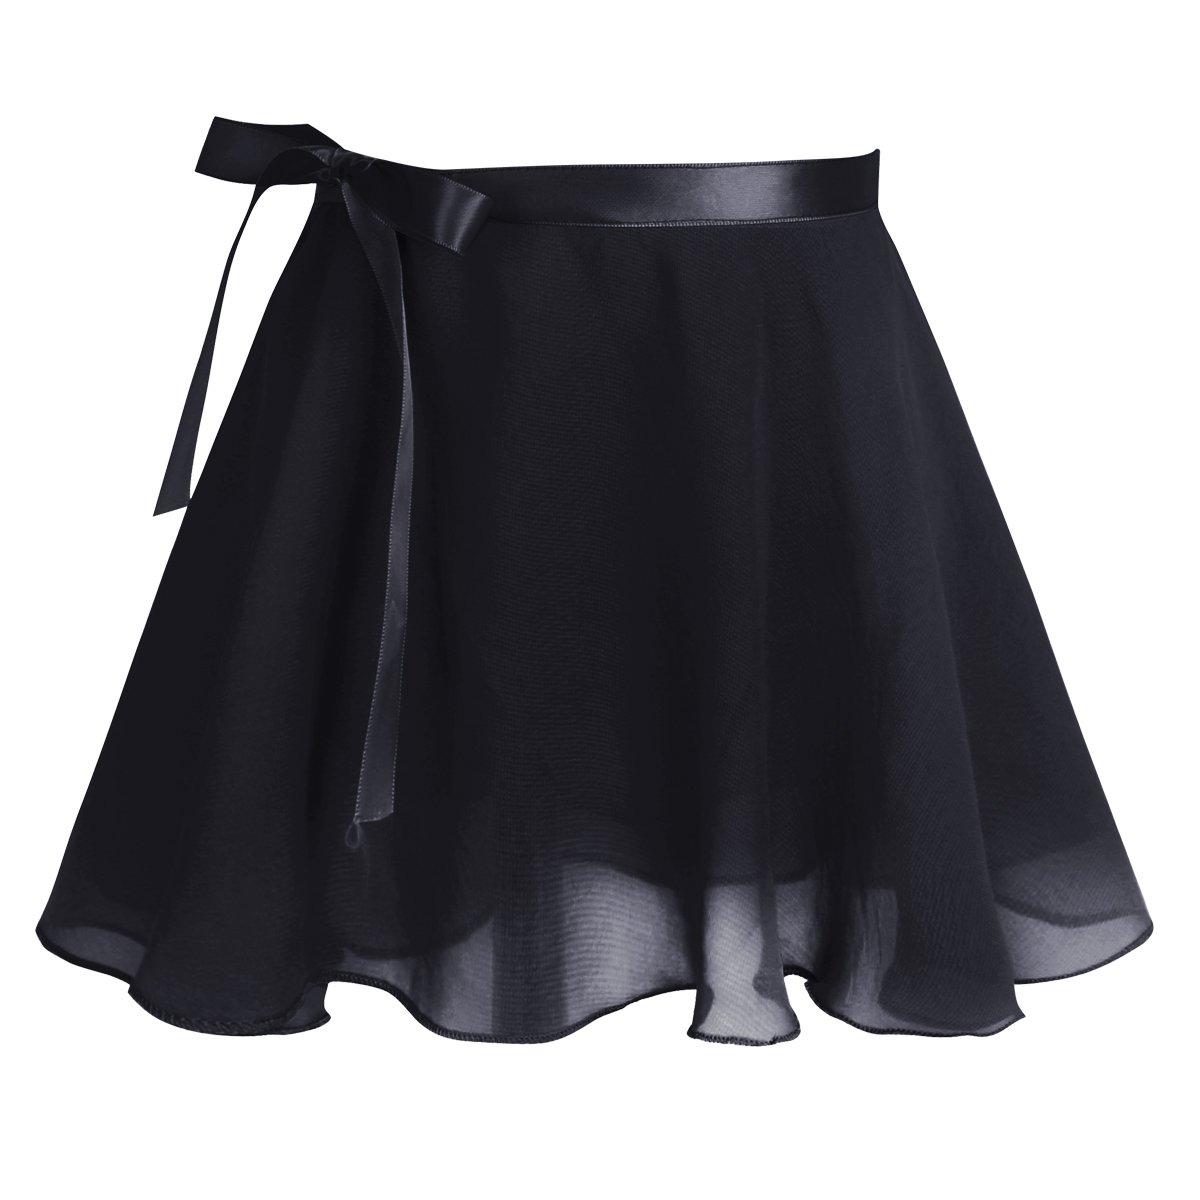 ranrann Girls Princess 2PCS Adjustable Straps Cotton Ballet Leotard with Chiffon Wrap Skirt Set